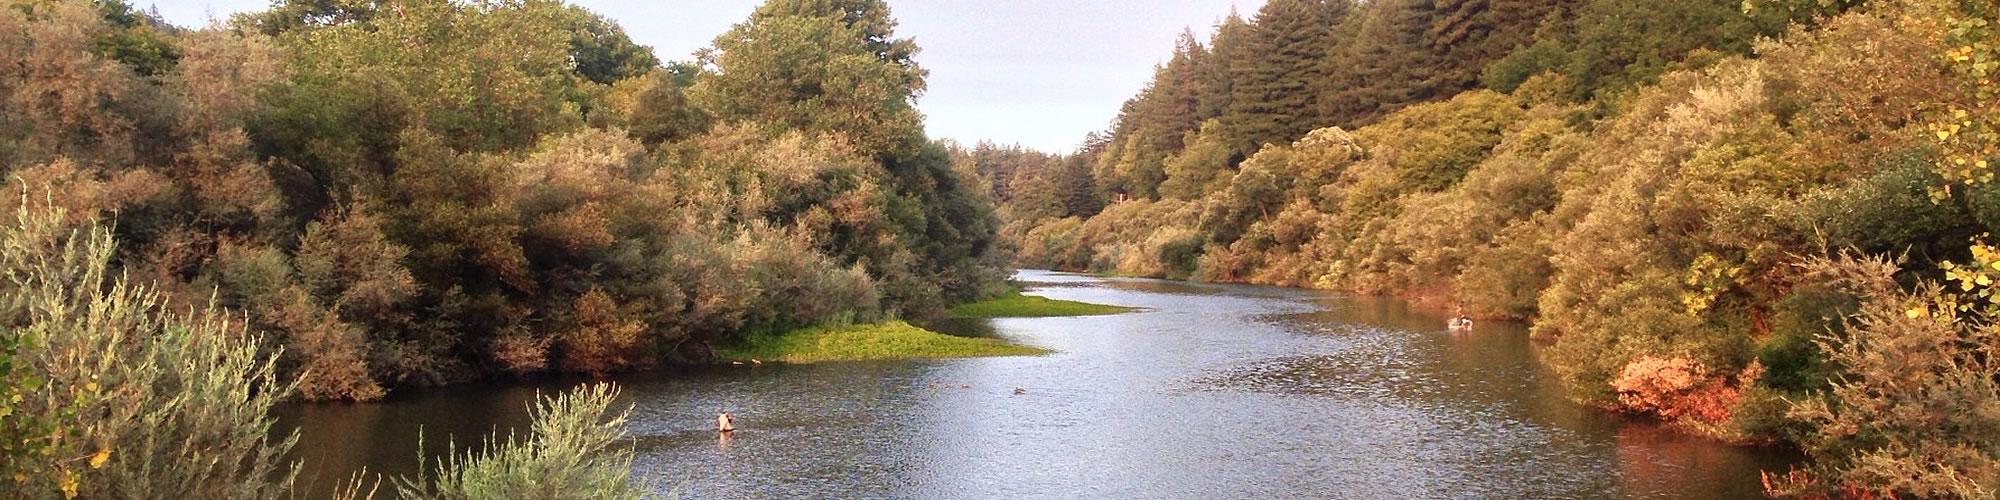 Russian river lodging applewood inn guerneville for Russian river cabins guerneville